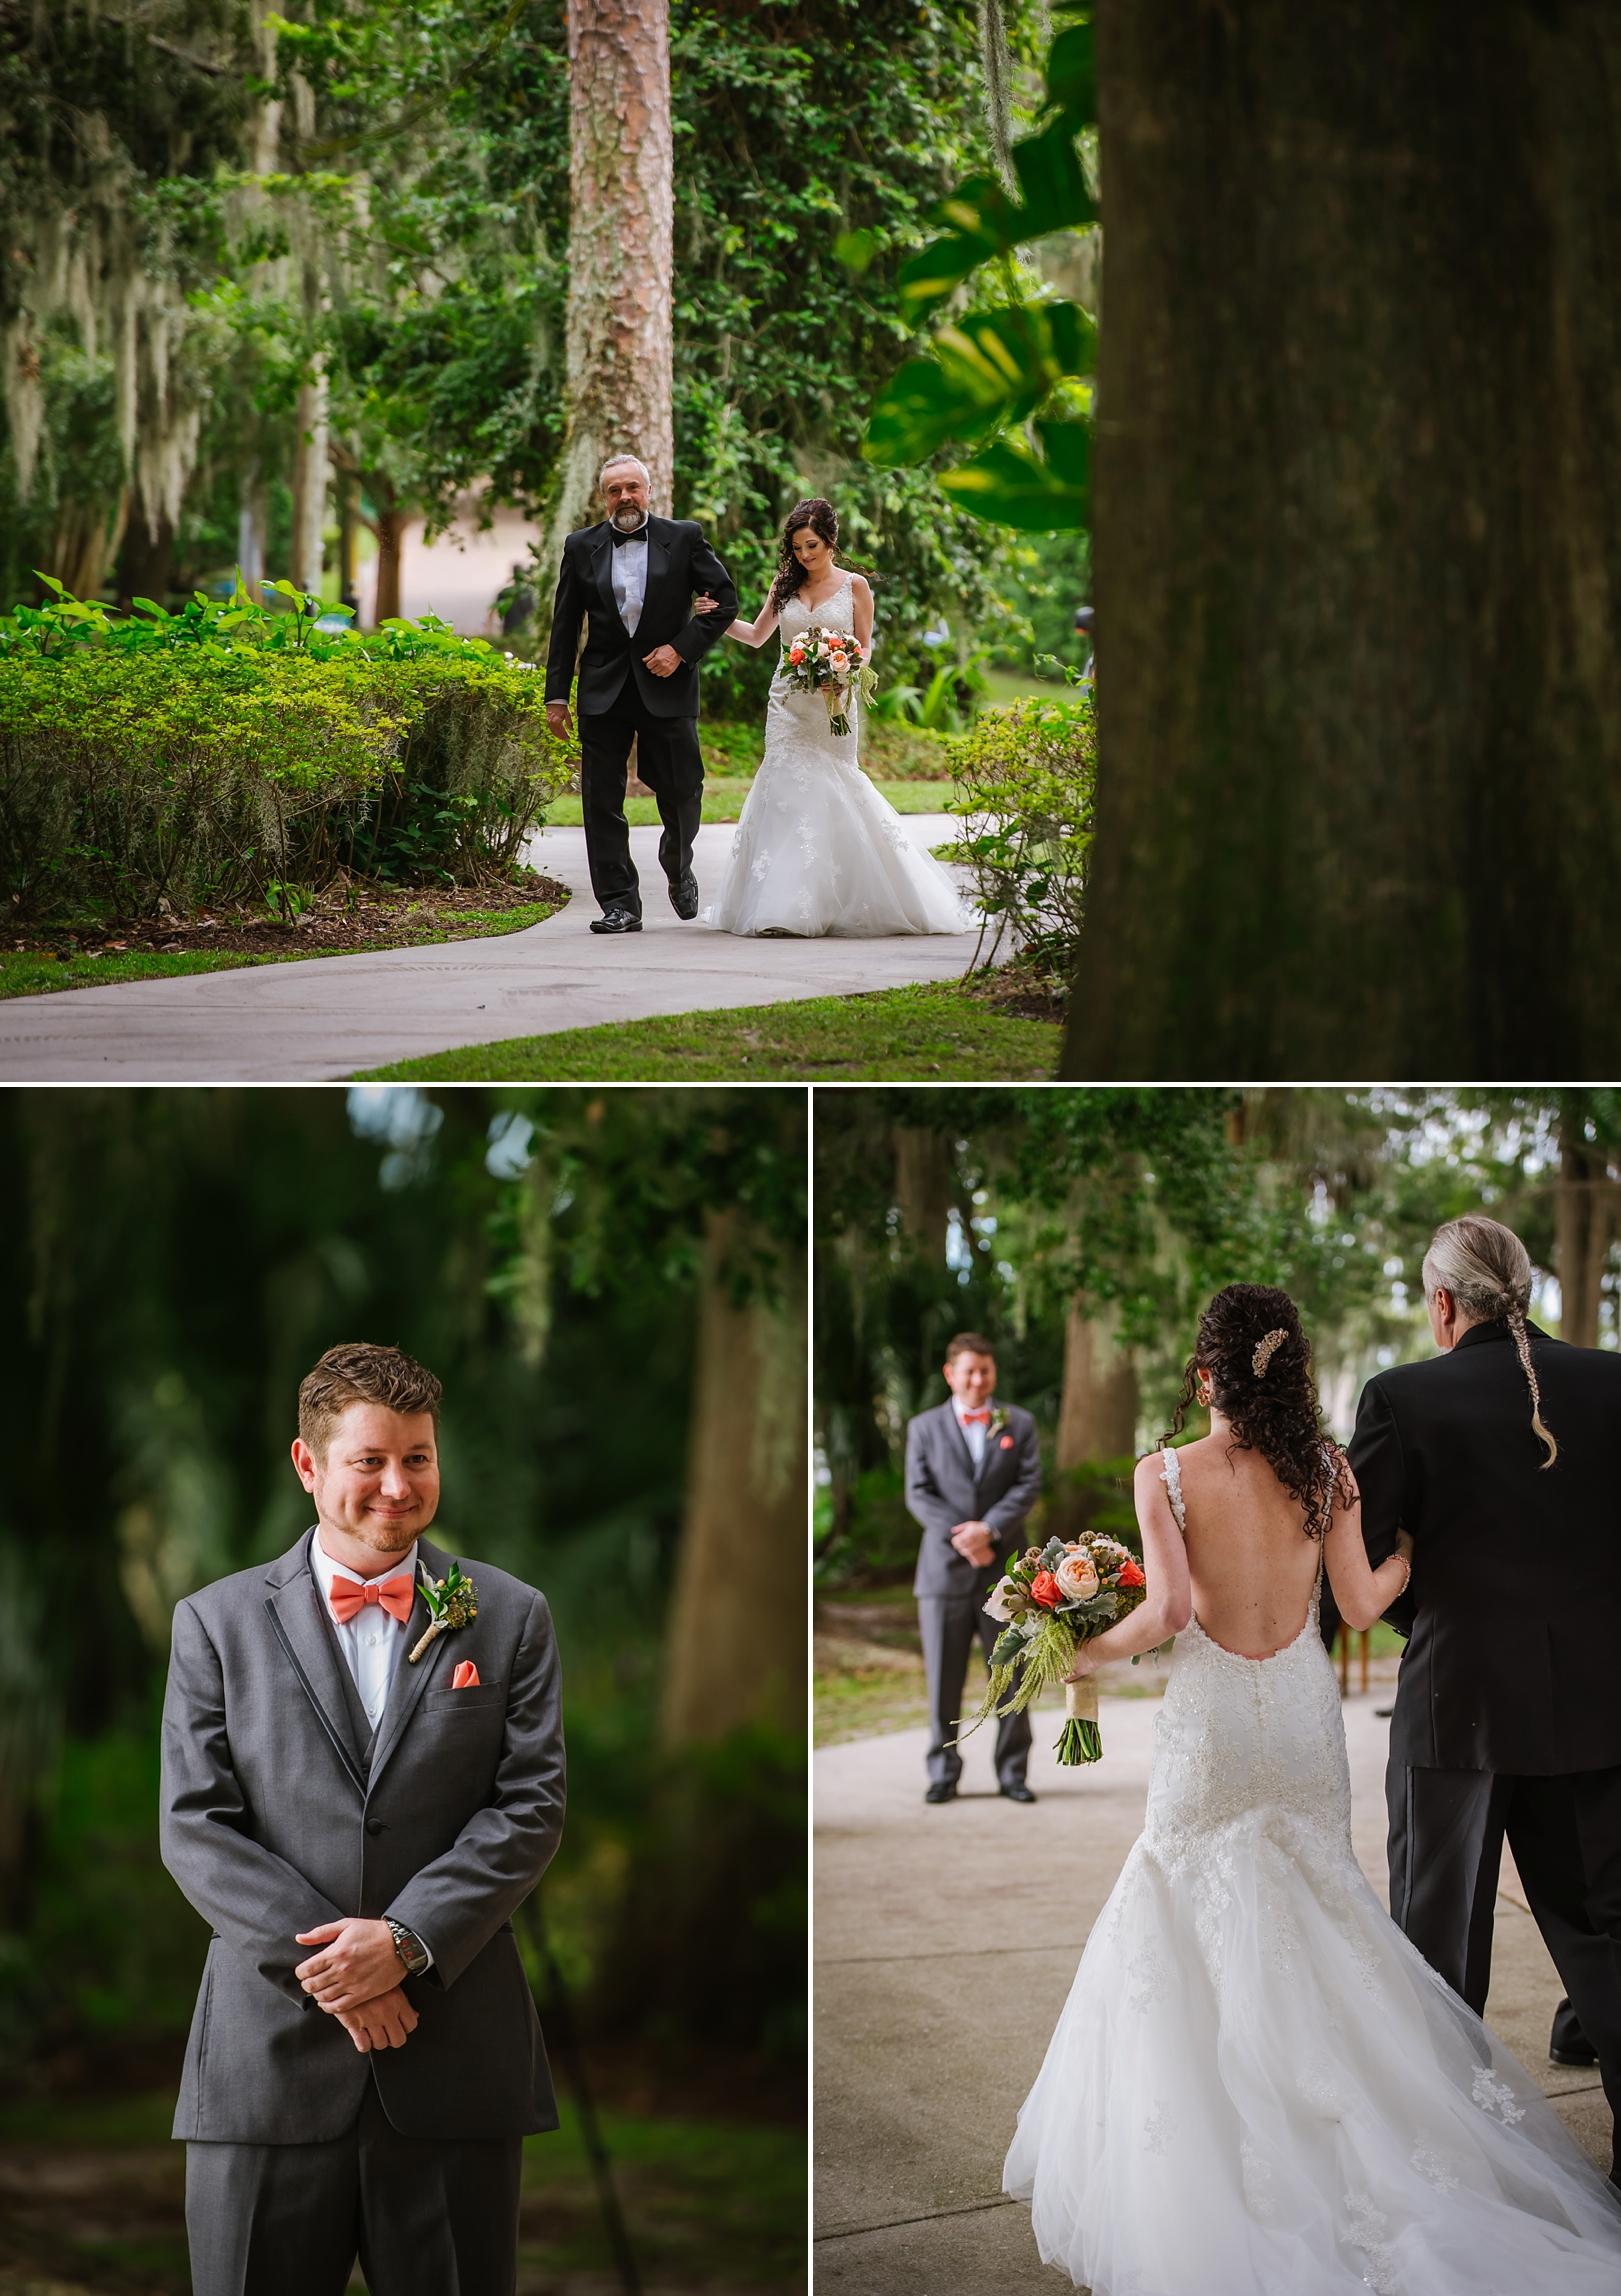 kraft-azalea-gardens-stylish-elopment-wedding-photography_0011.jpg